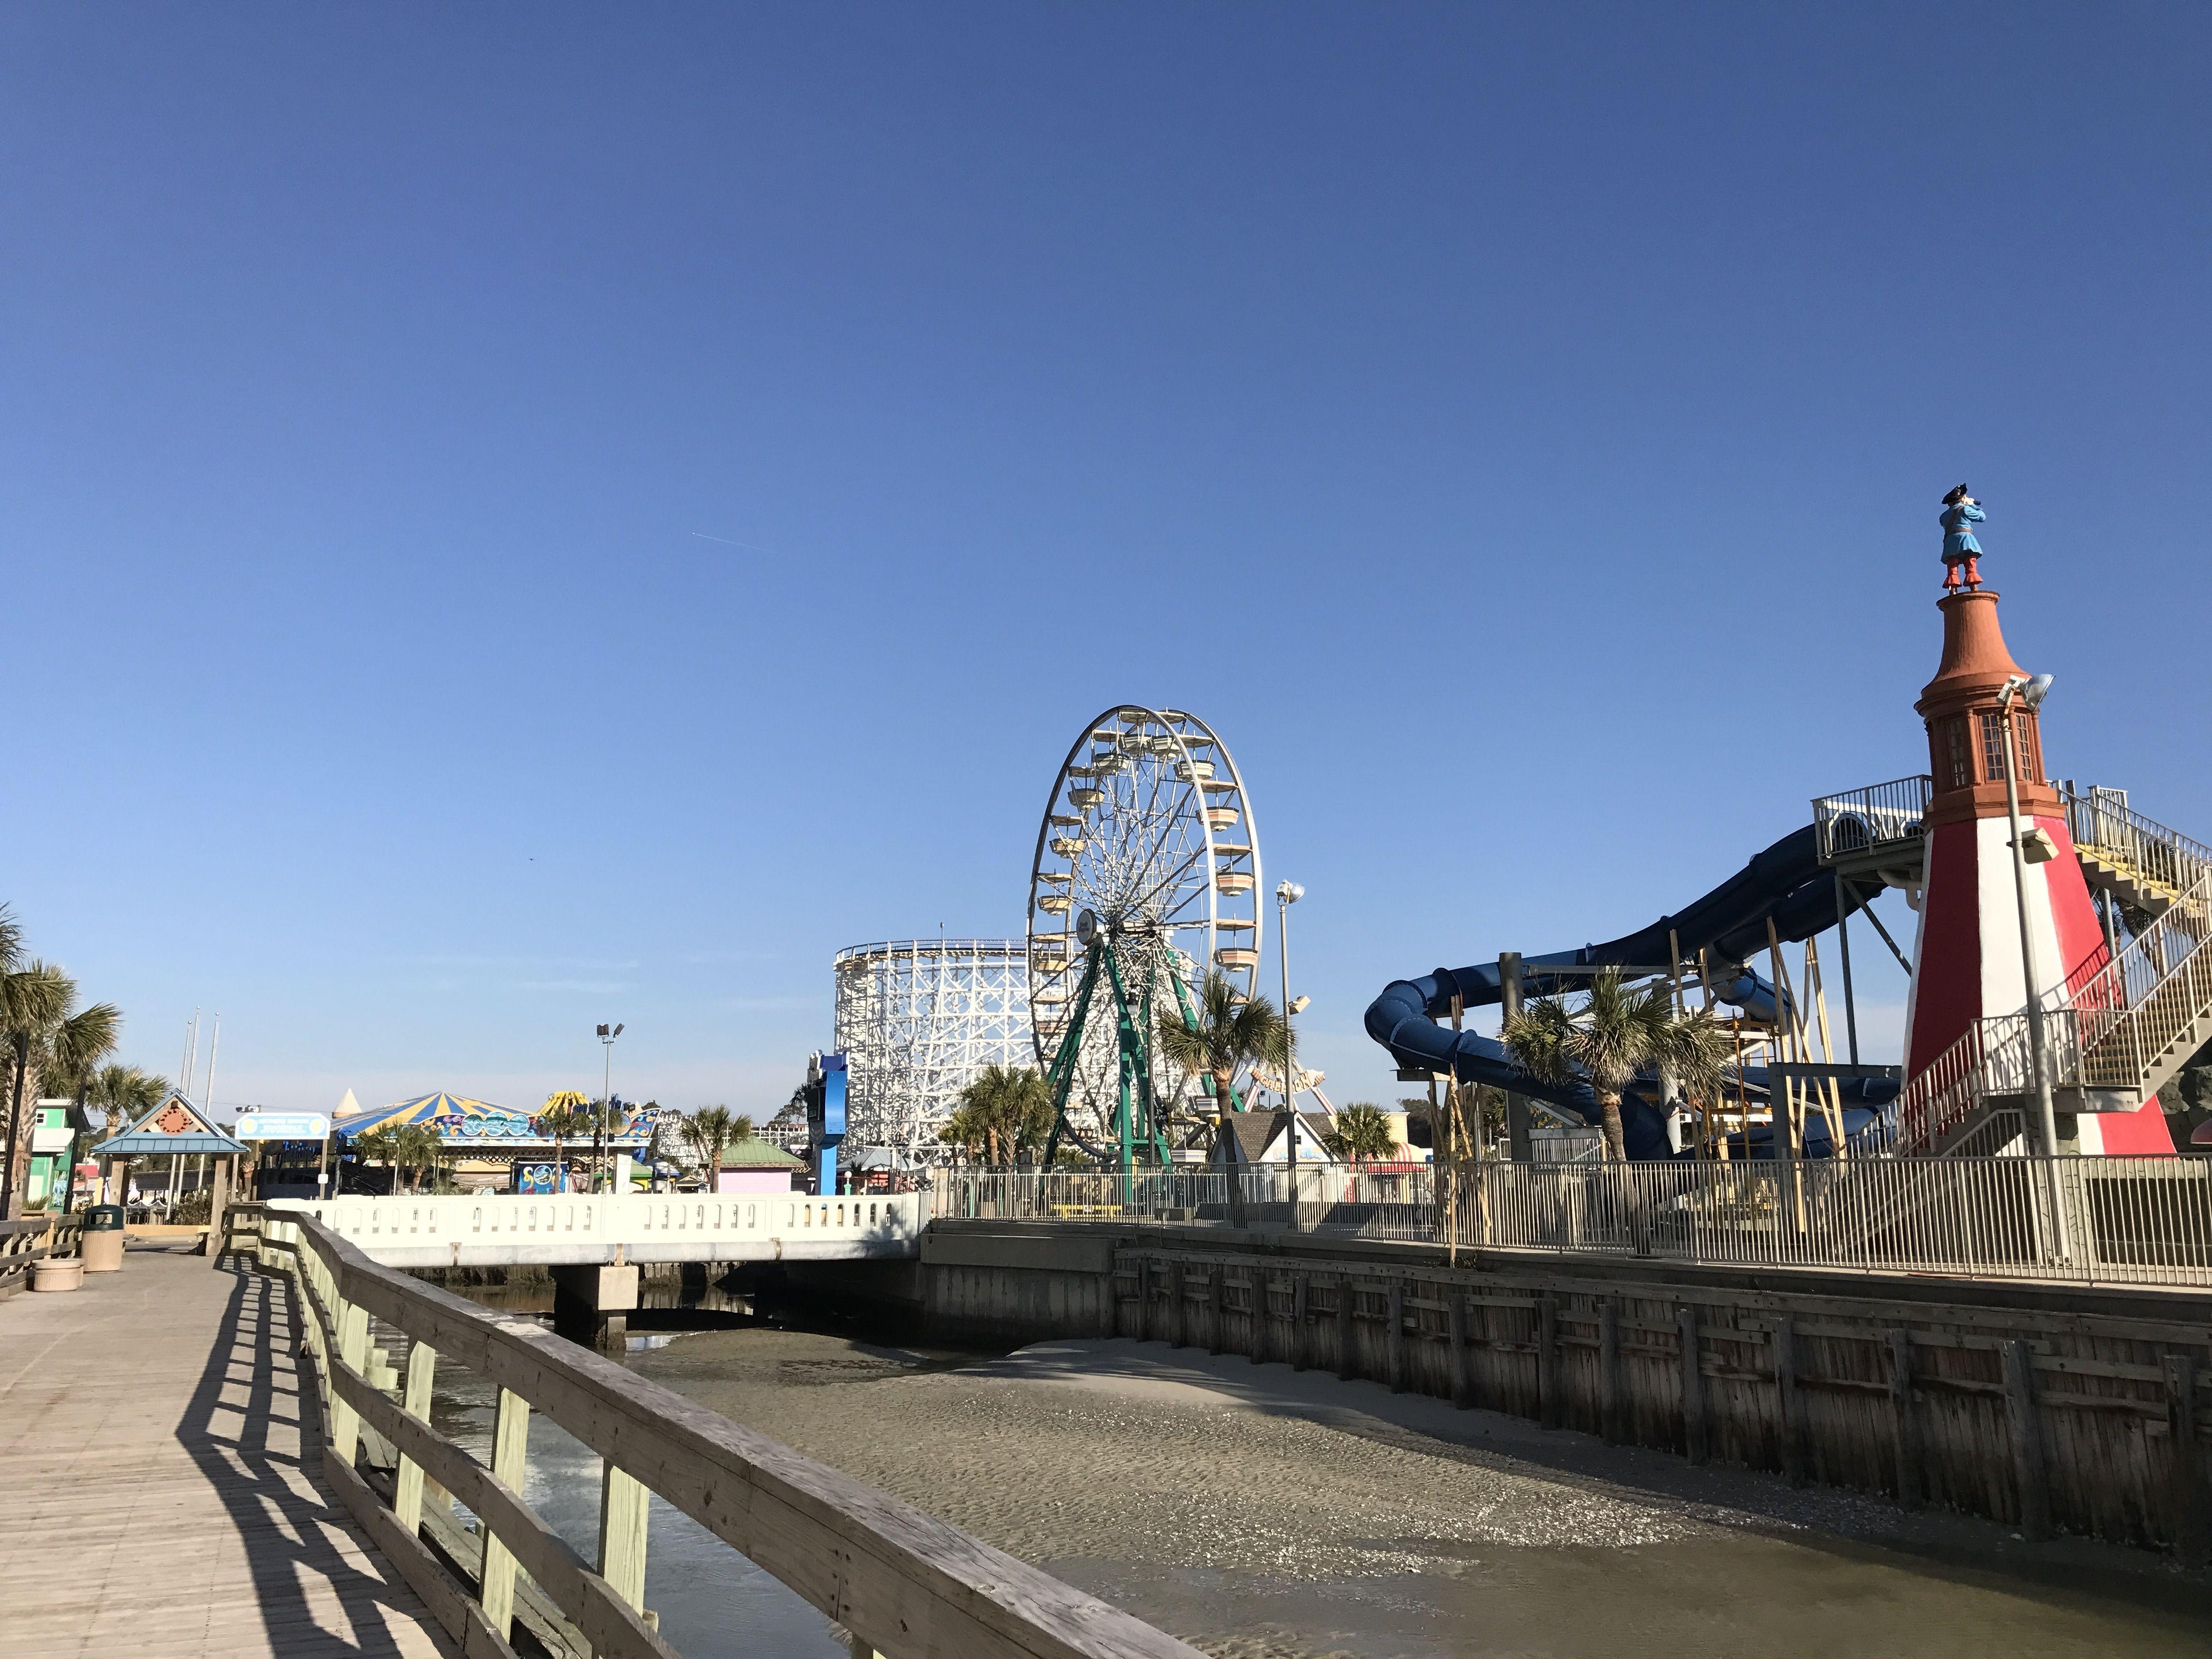 Myrtle Beach South Carolina Family Kingdom Amusement Park With